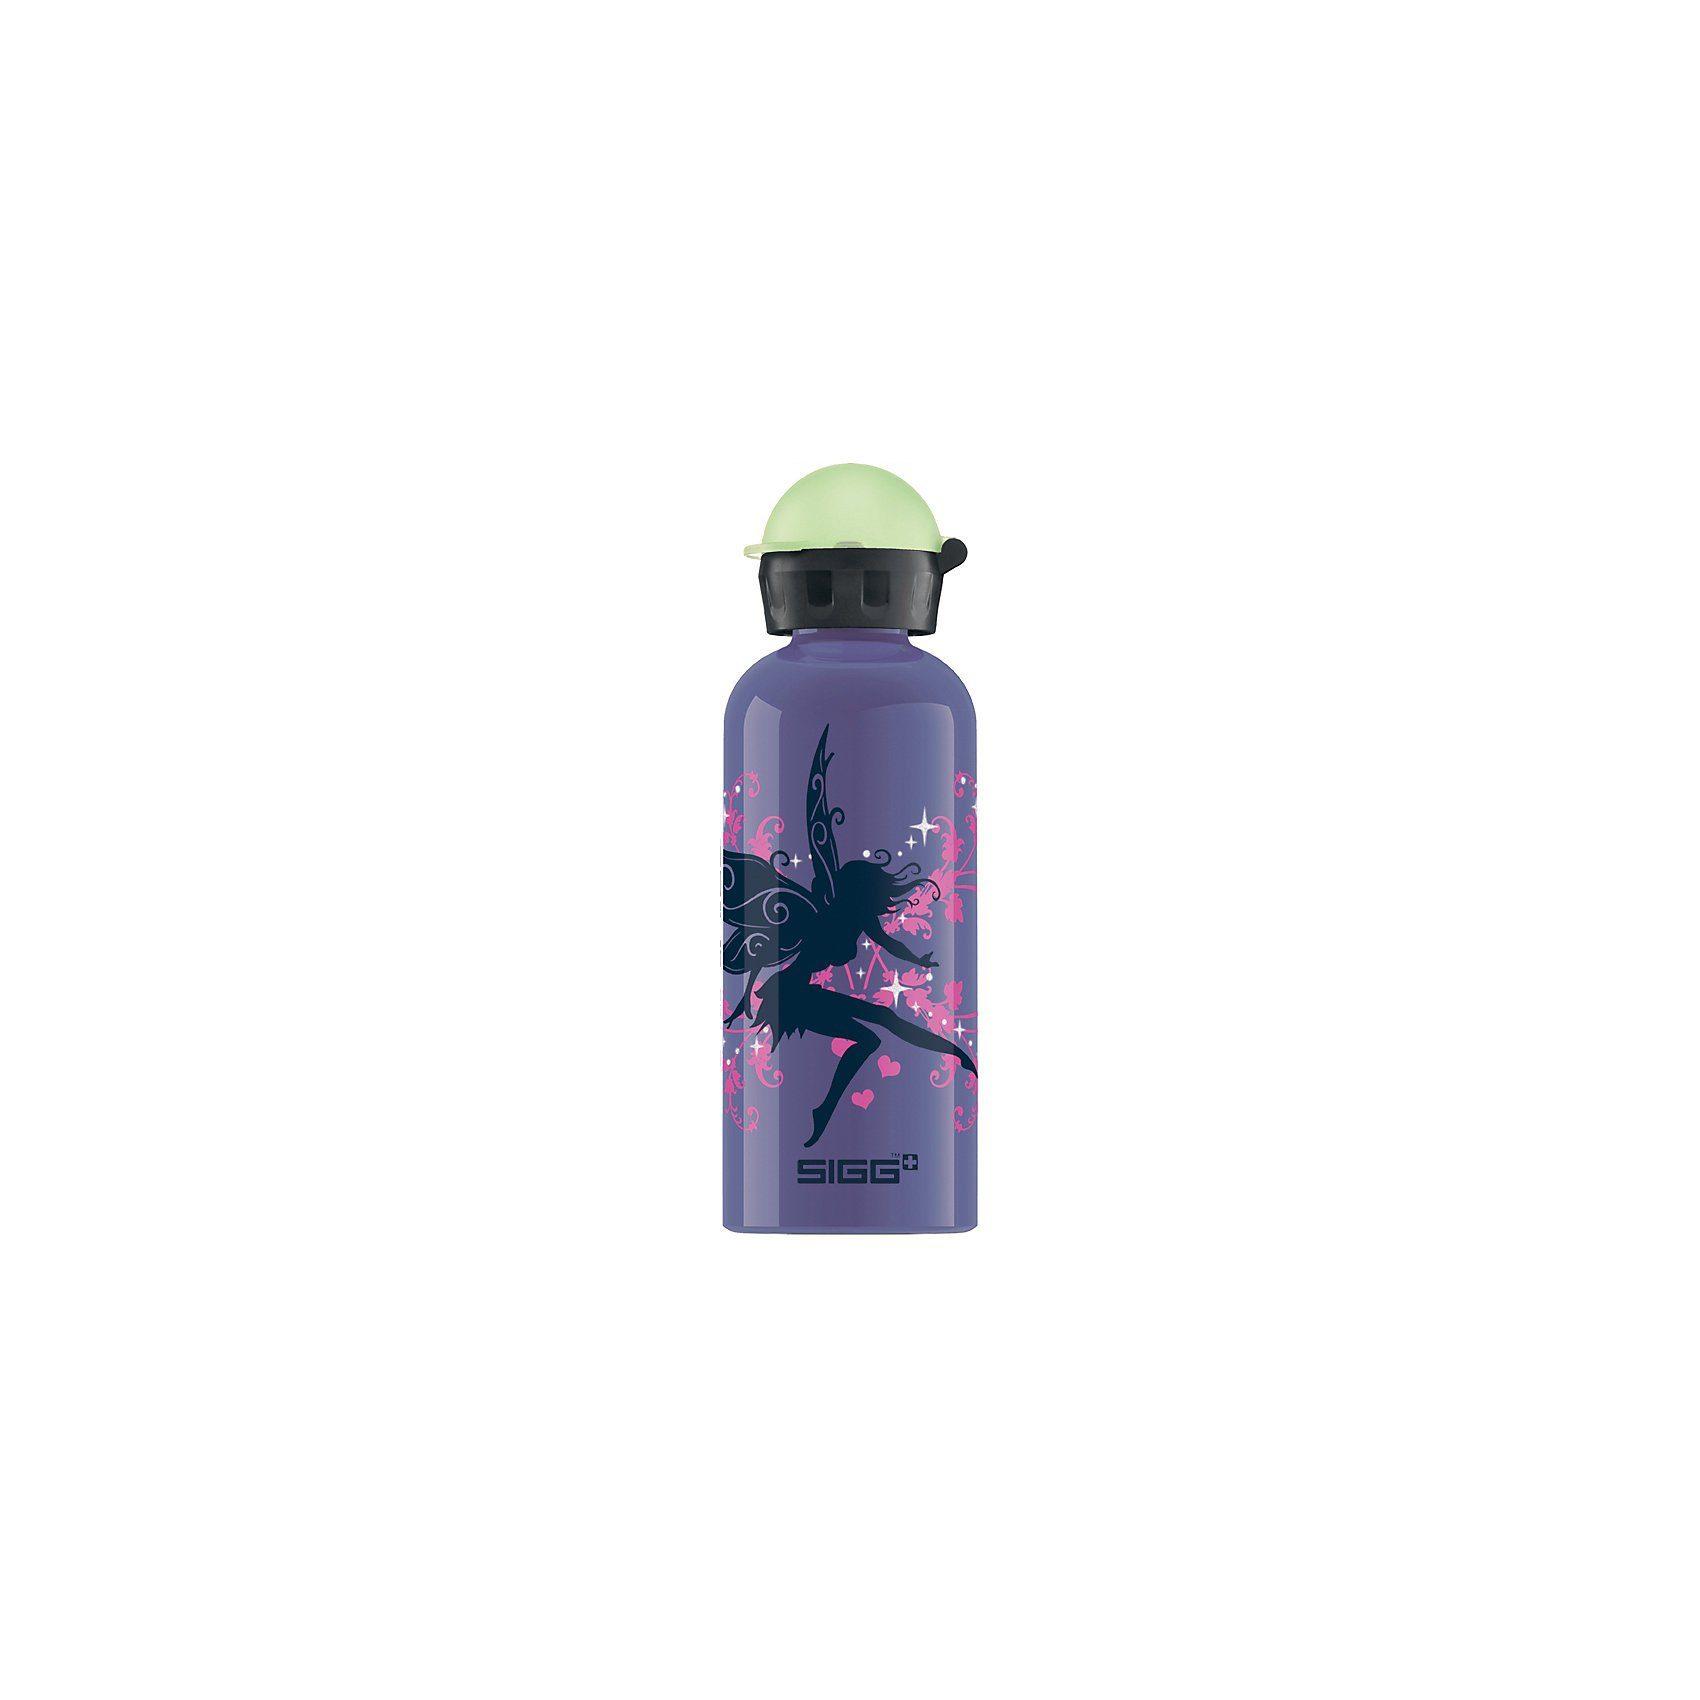 SIGG Alu-Trinkflasche Sparkle Fairy, 600 ml